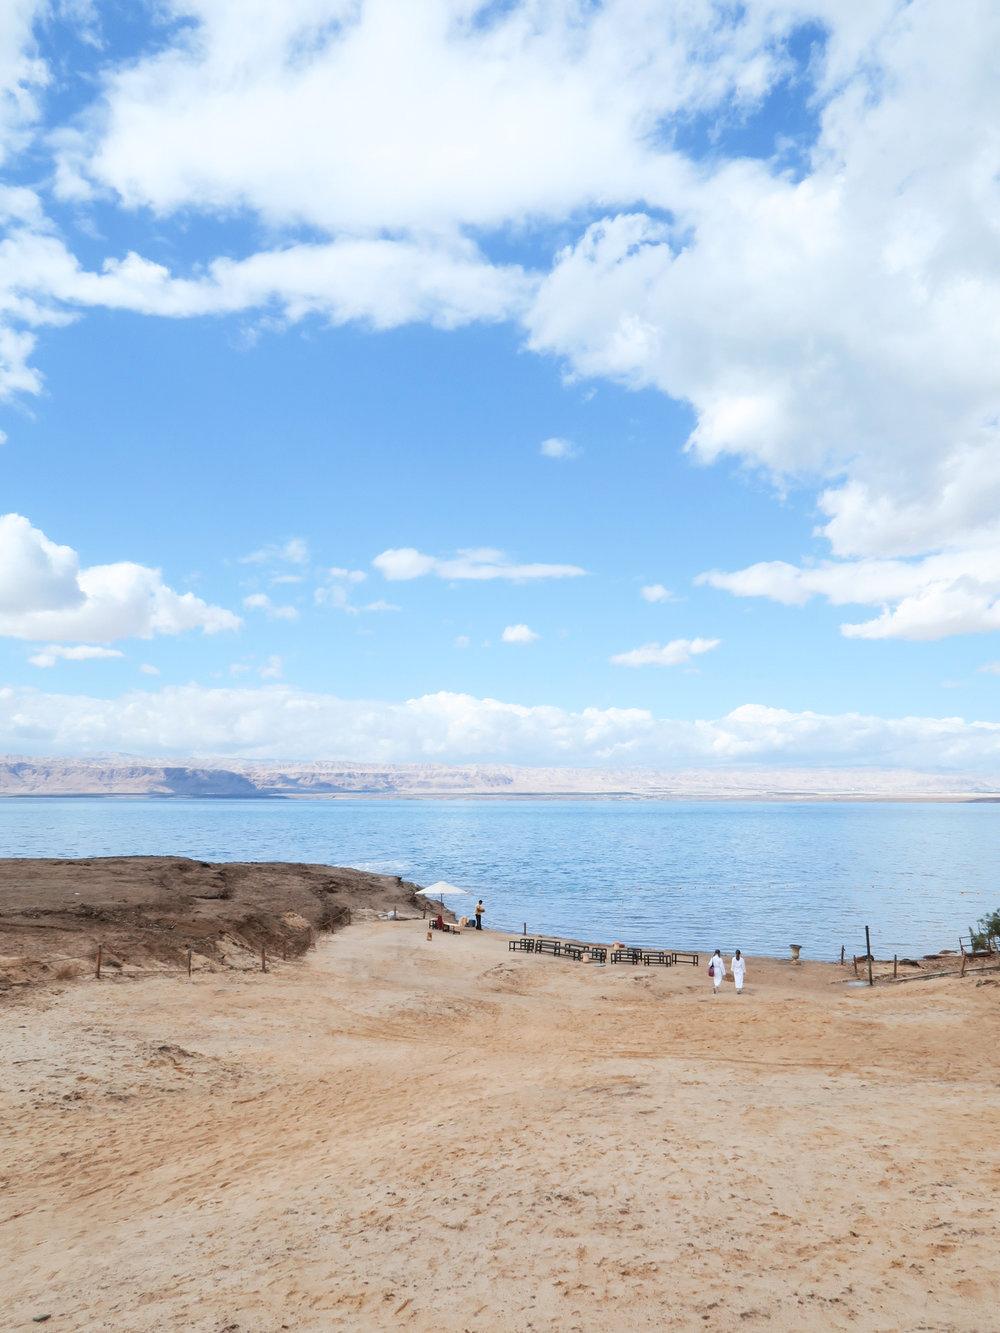 travellur_slow_travel_destination_jordan_swim_sea.jpg.jpg